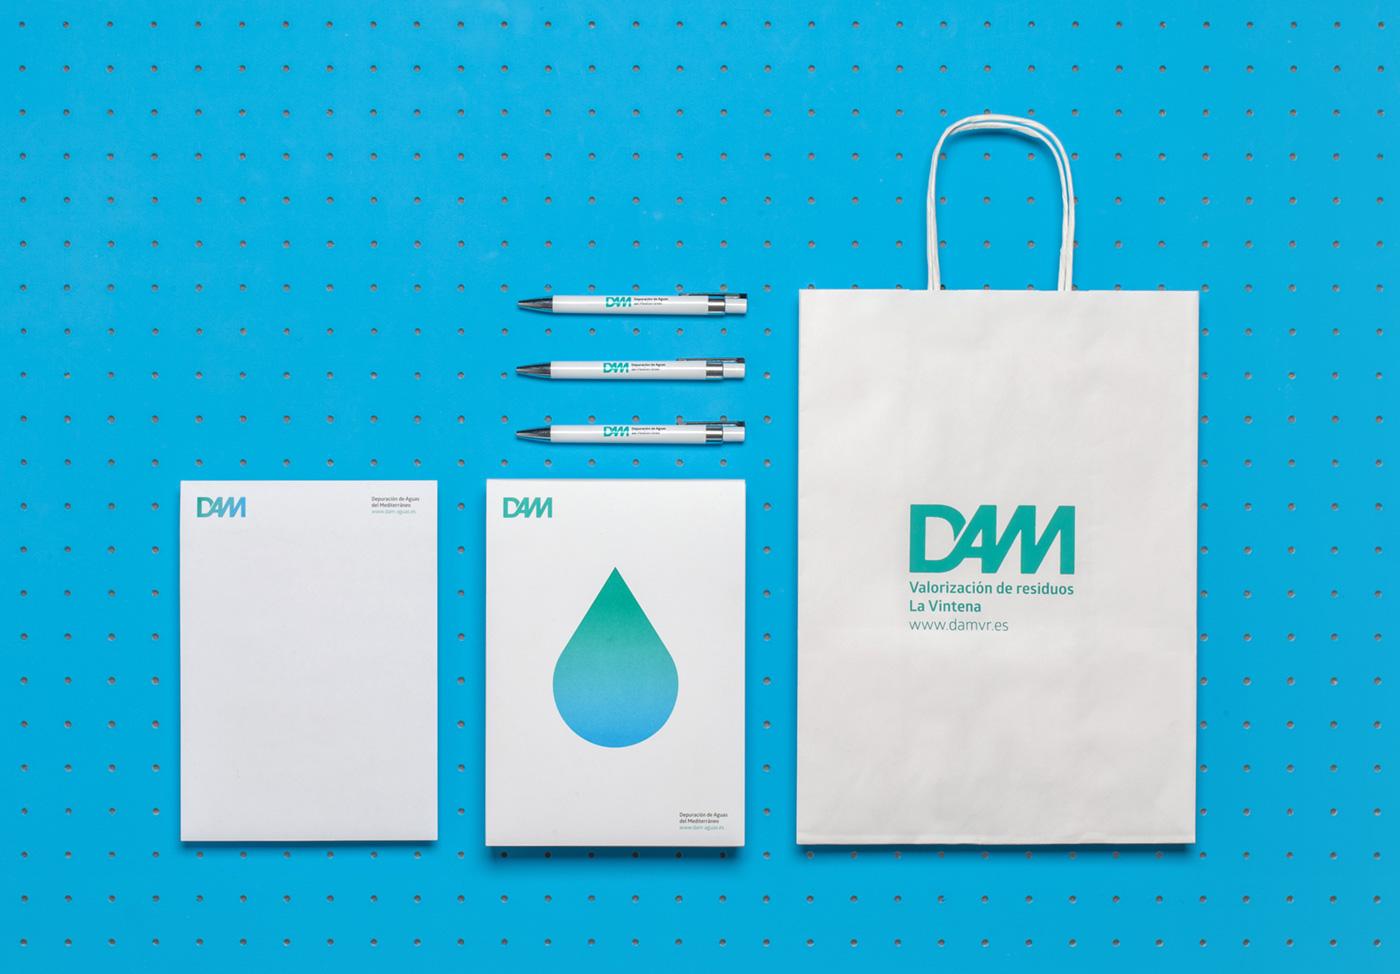 pixelarte-diseno-grafico-marca-Dam_Depuracion_Aguas_Mediterraneo